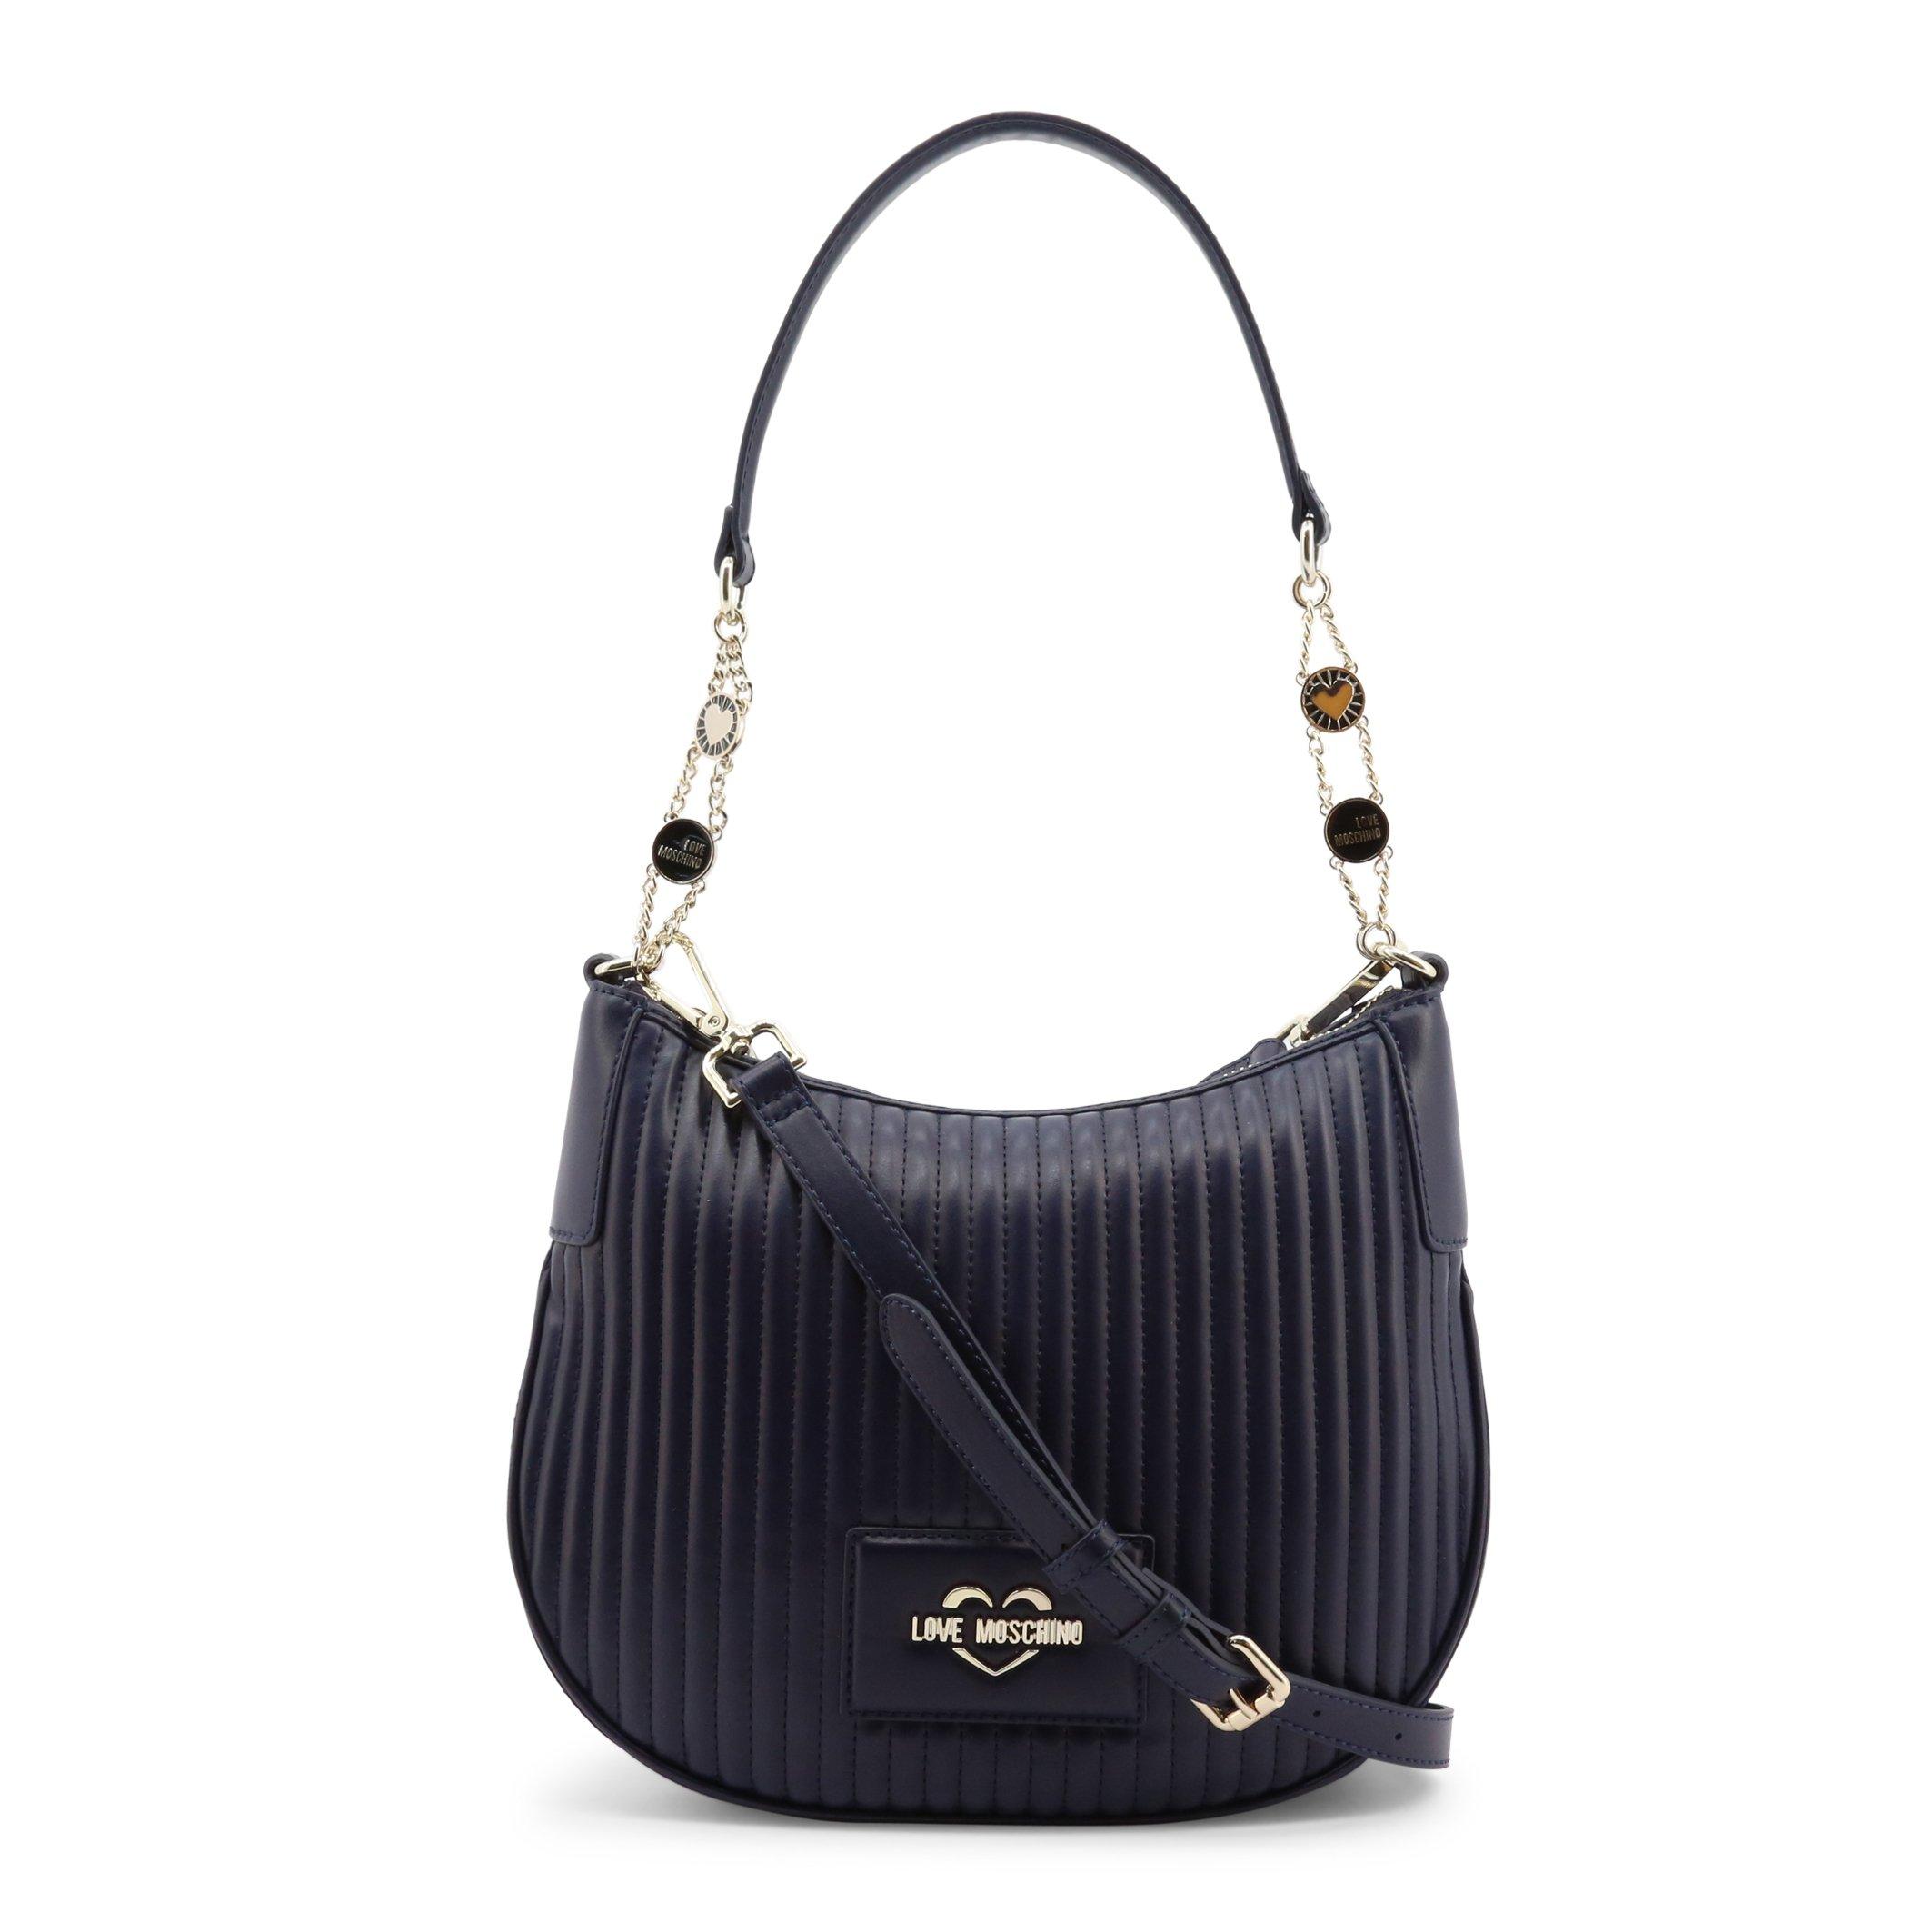 Love Moschino Women's Shoulder Bag Various Colours JC4140PP1DLB0 - blue NOSIZE